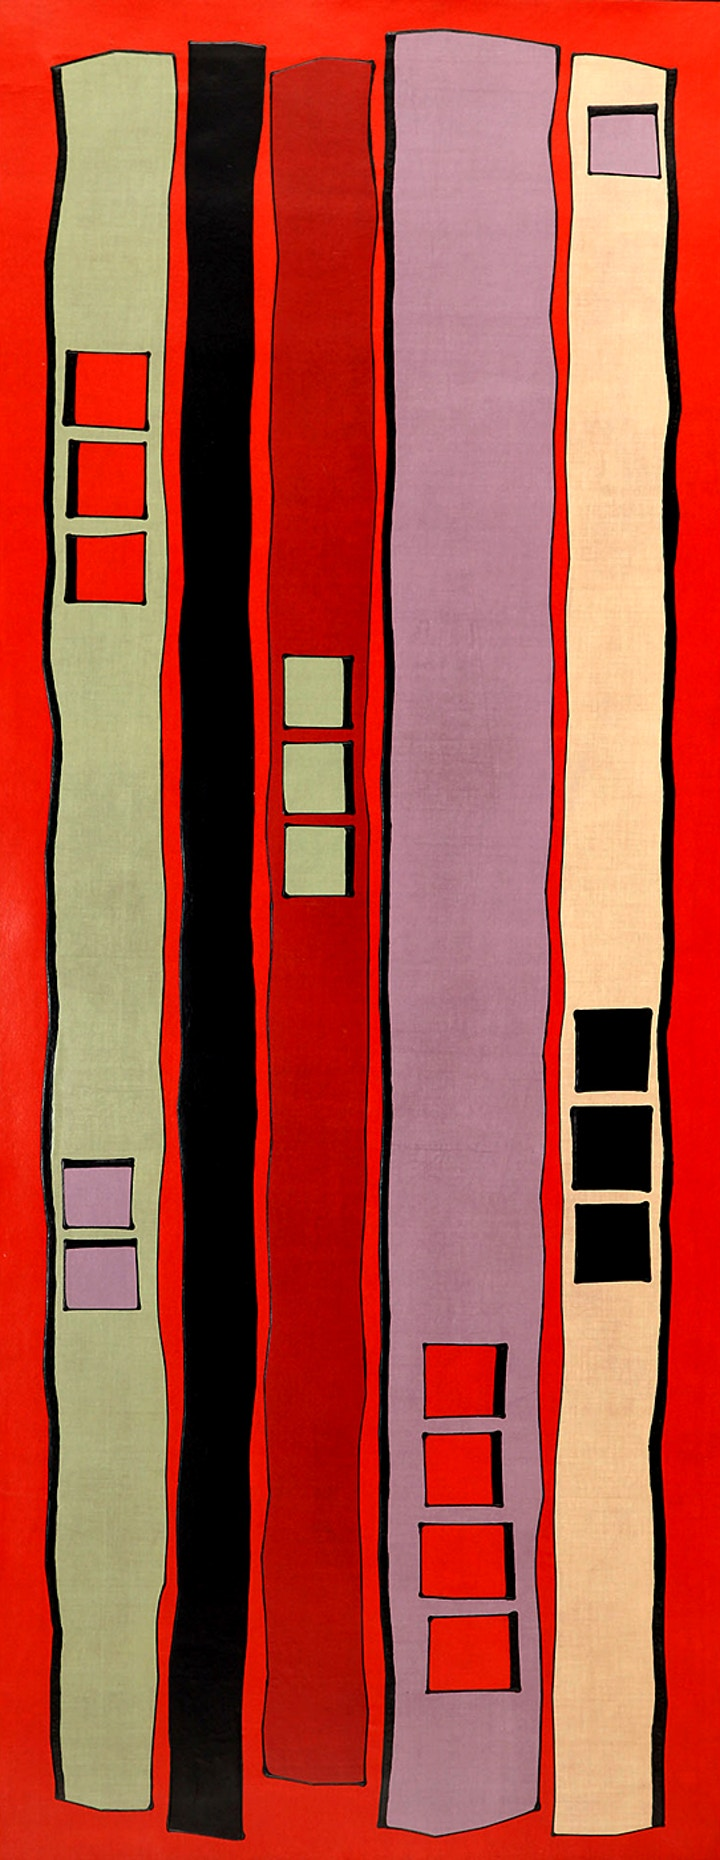 Sheree Sorrells with Ken Sorrells gallery 1 of 1